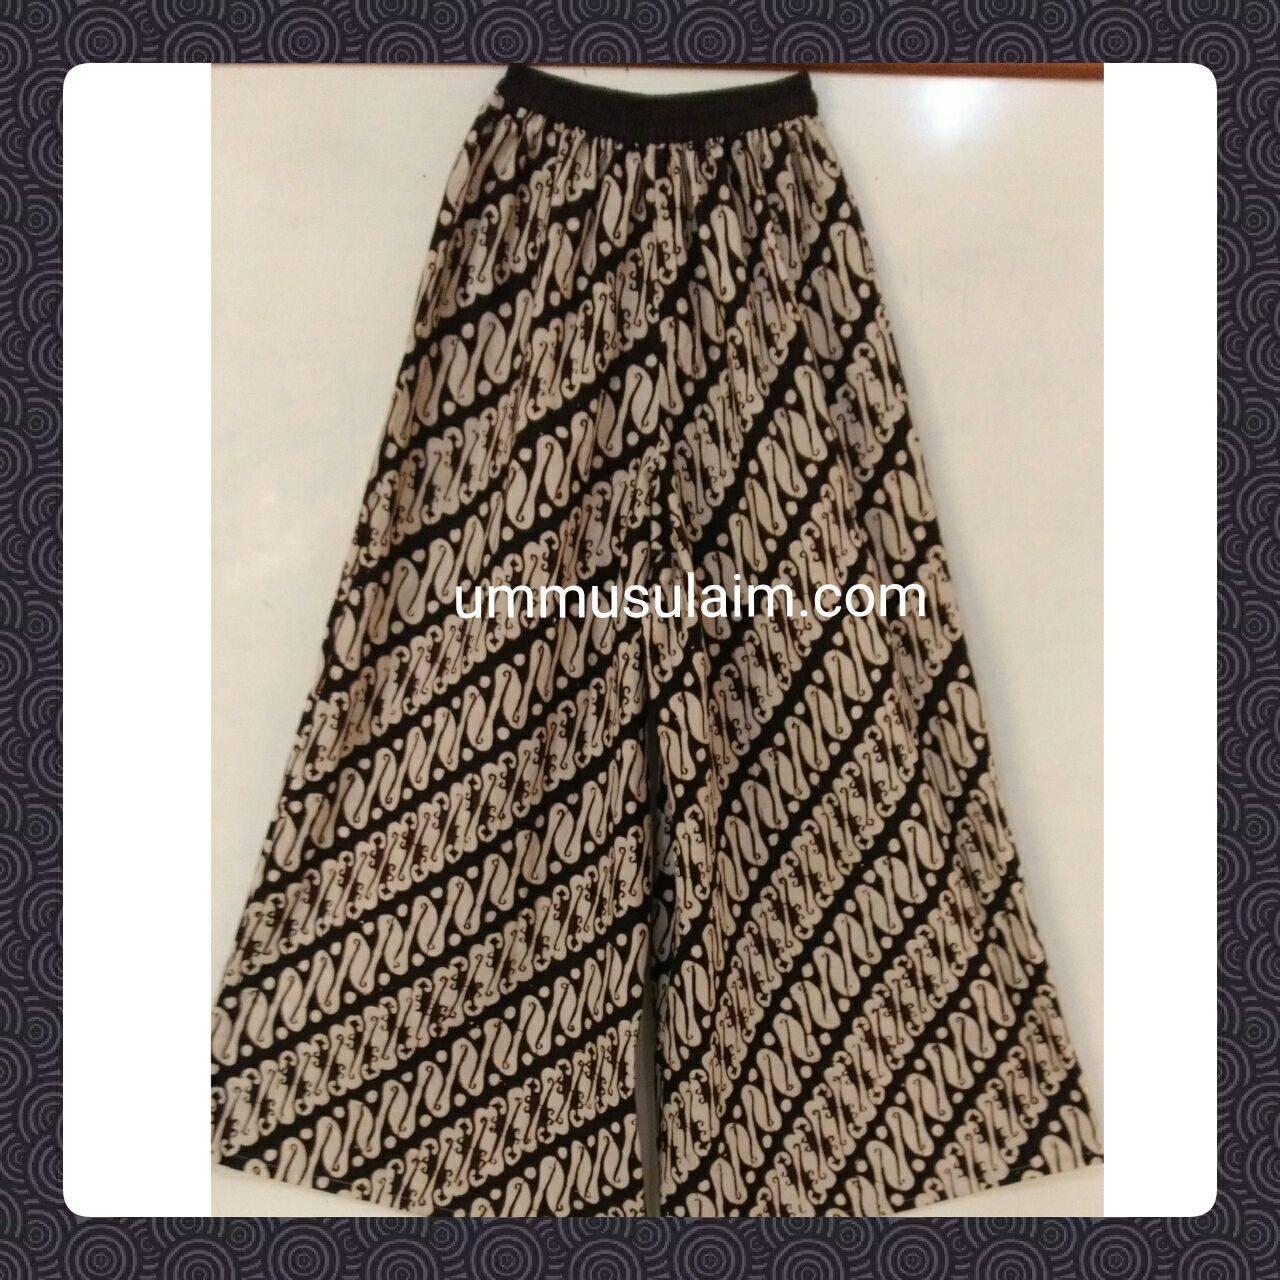 Kulot Parang 03 Spesifikasi: Bahan batik cap motif parang dg bahan katun All size, pinggang elastis, panggul +-125, lungkar ujung kaki +- 57 Harga 120.000  Ummu Sulaim Muslimah Shop […]